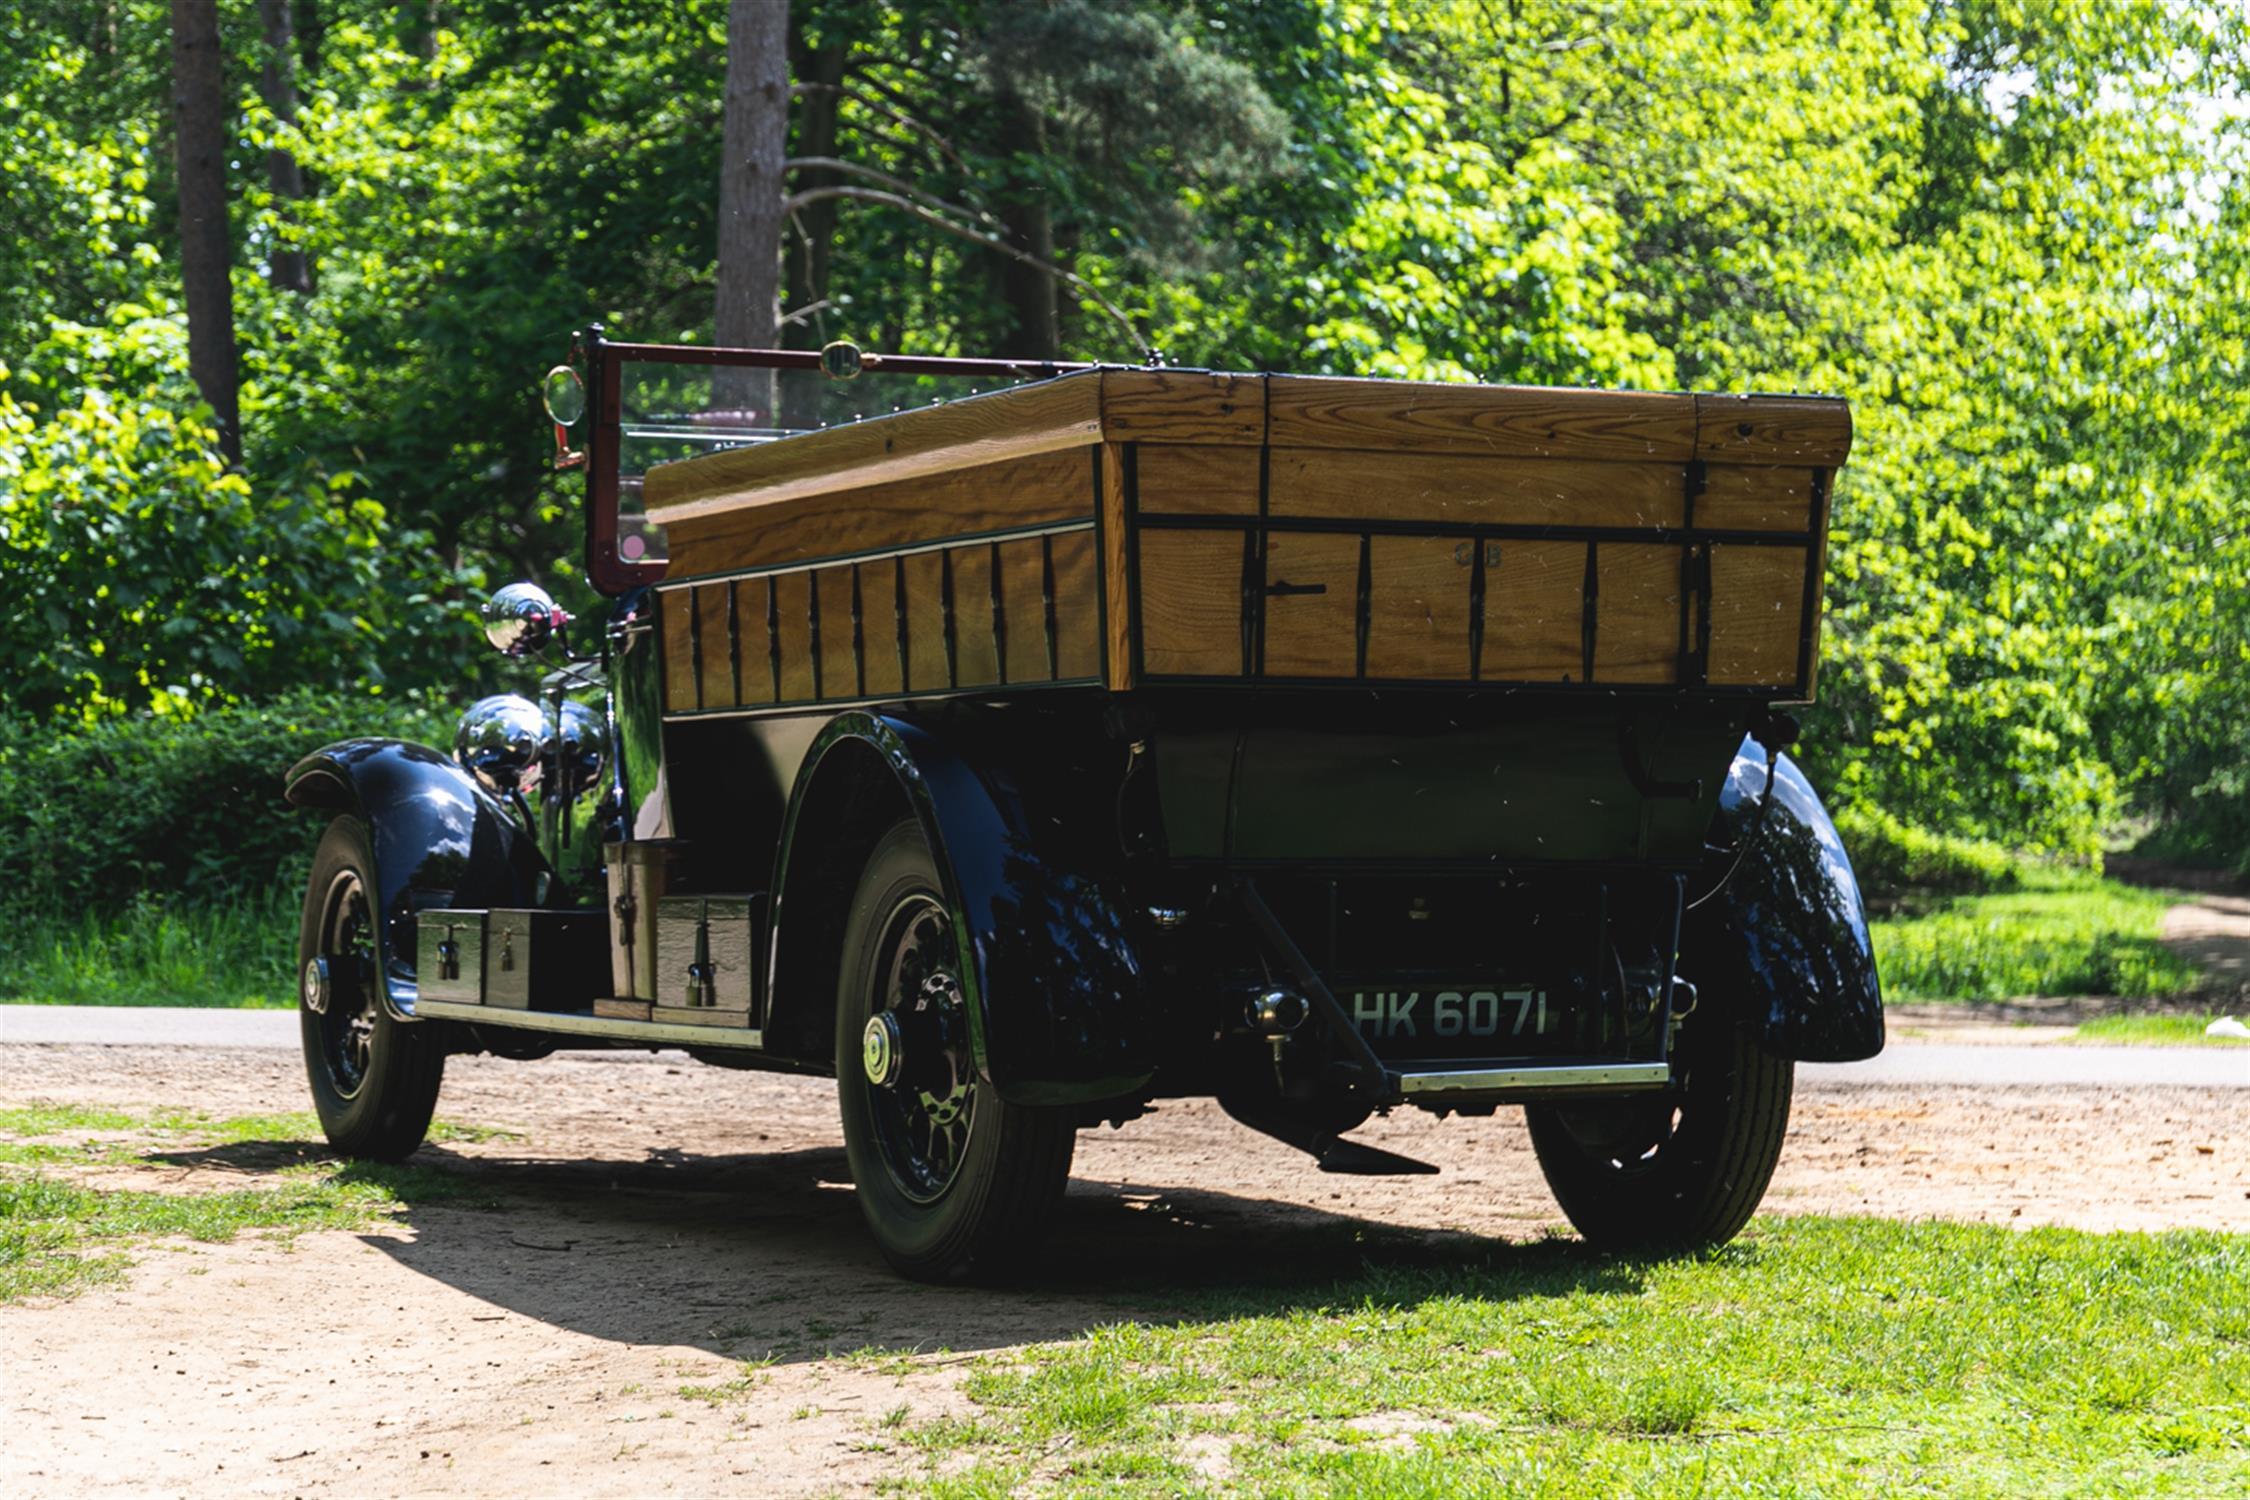 1927 Rolls-Royce Phantom 1 Open Tourer - Image 2 of 10